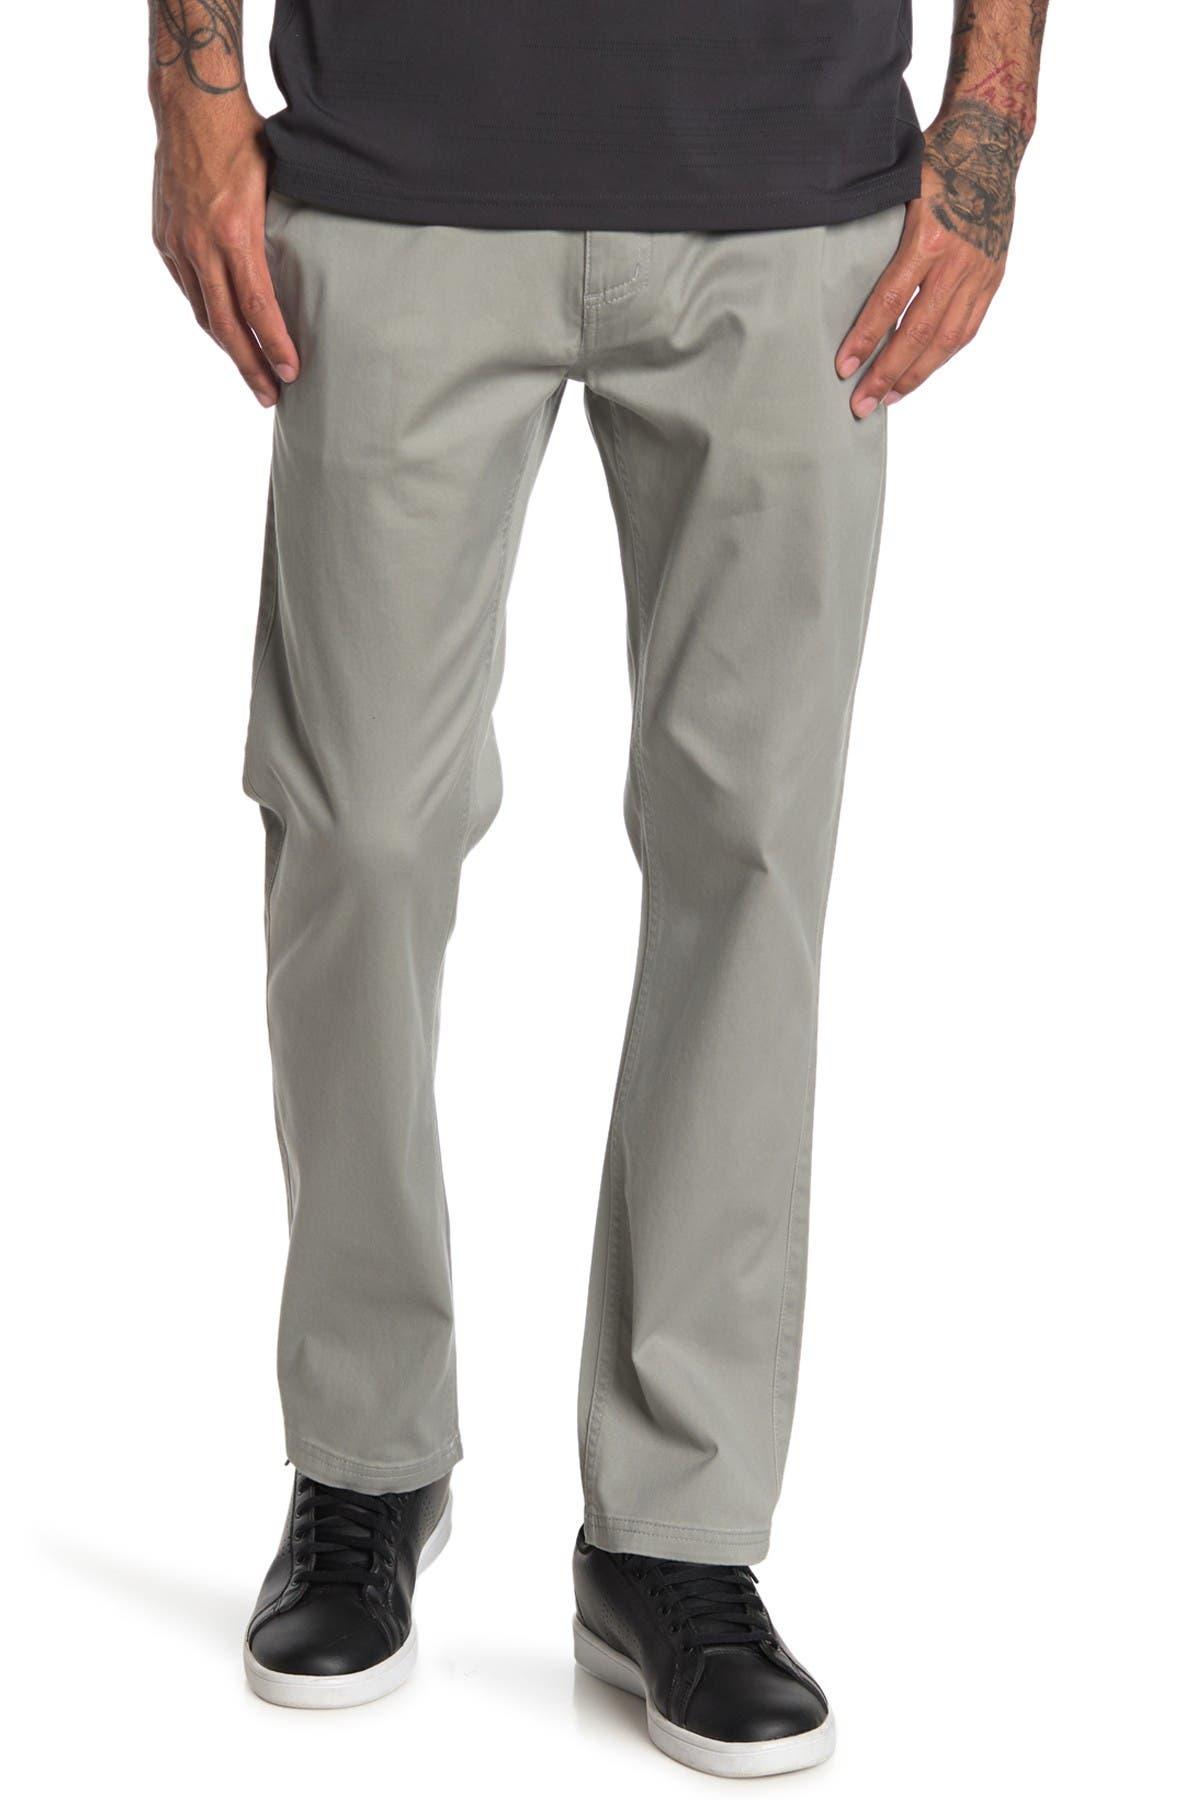 Image of Oakley Stone Wash Chino Pants